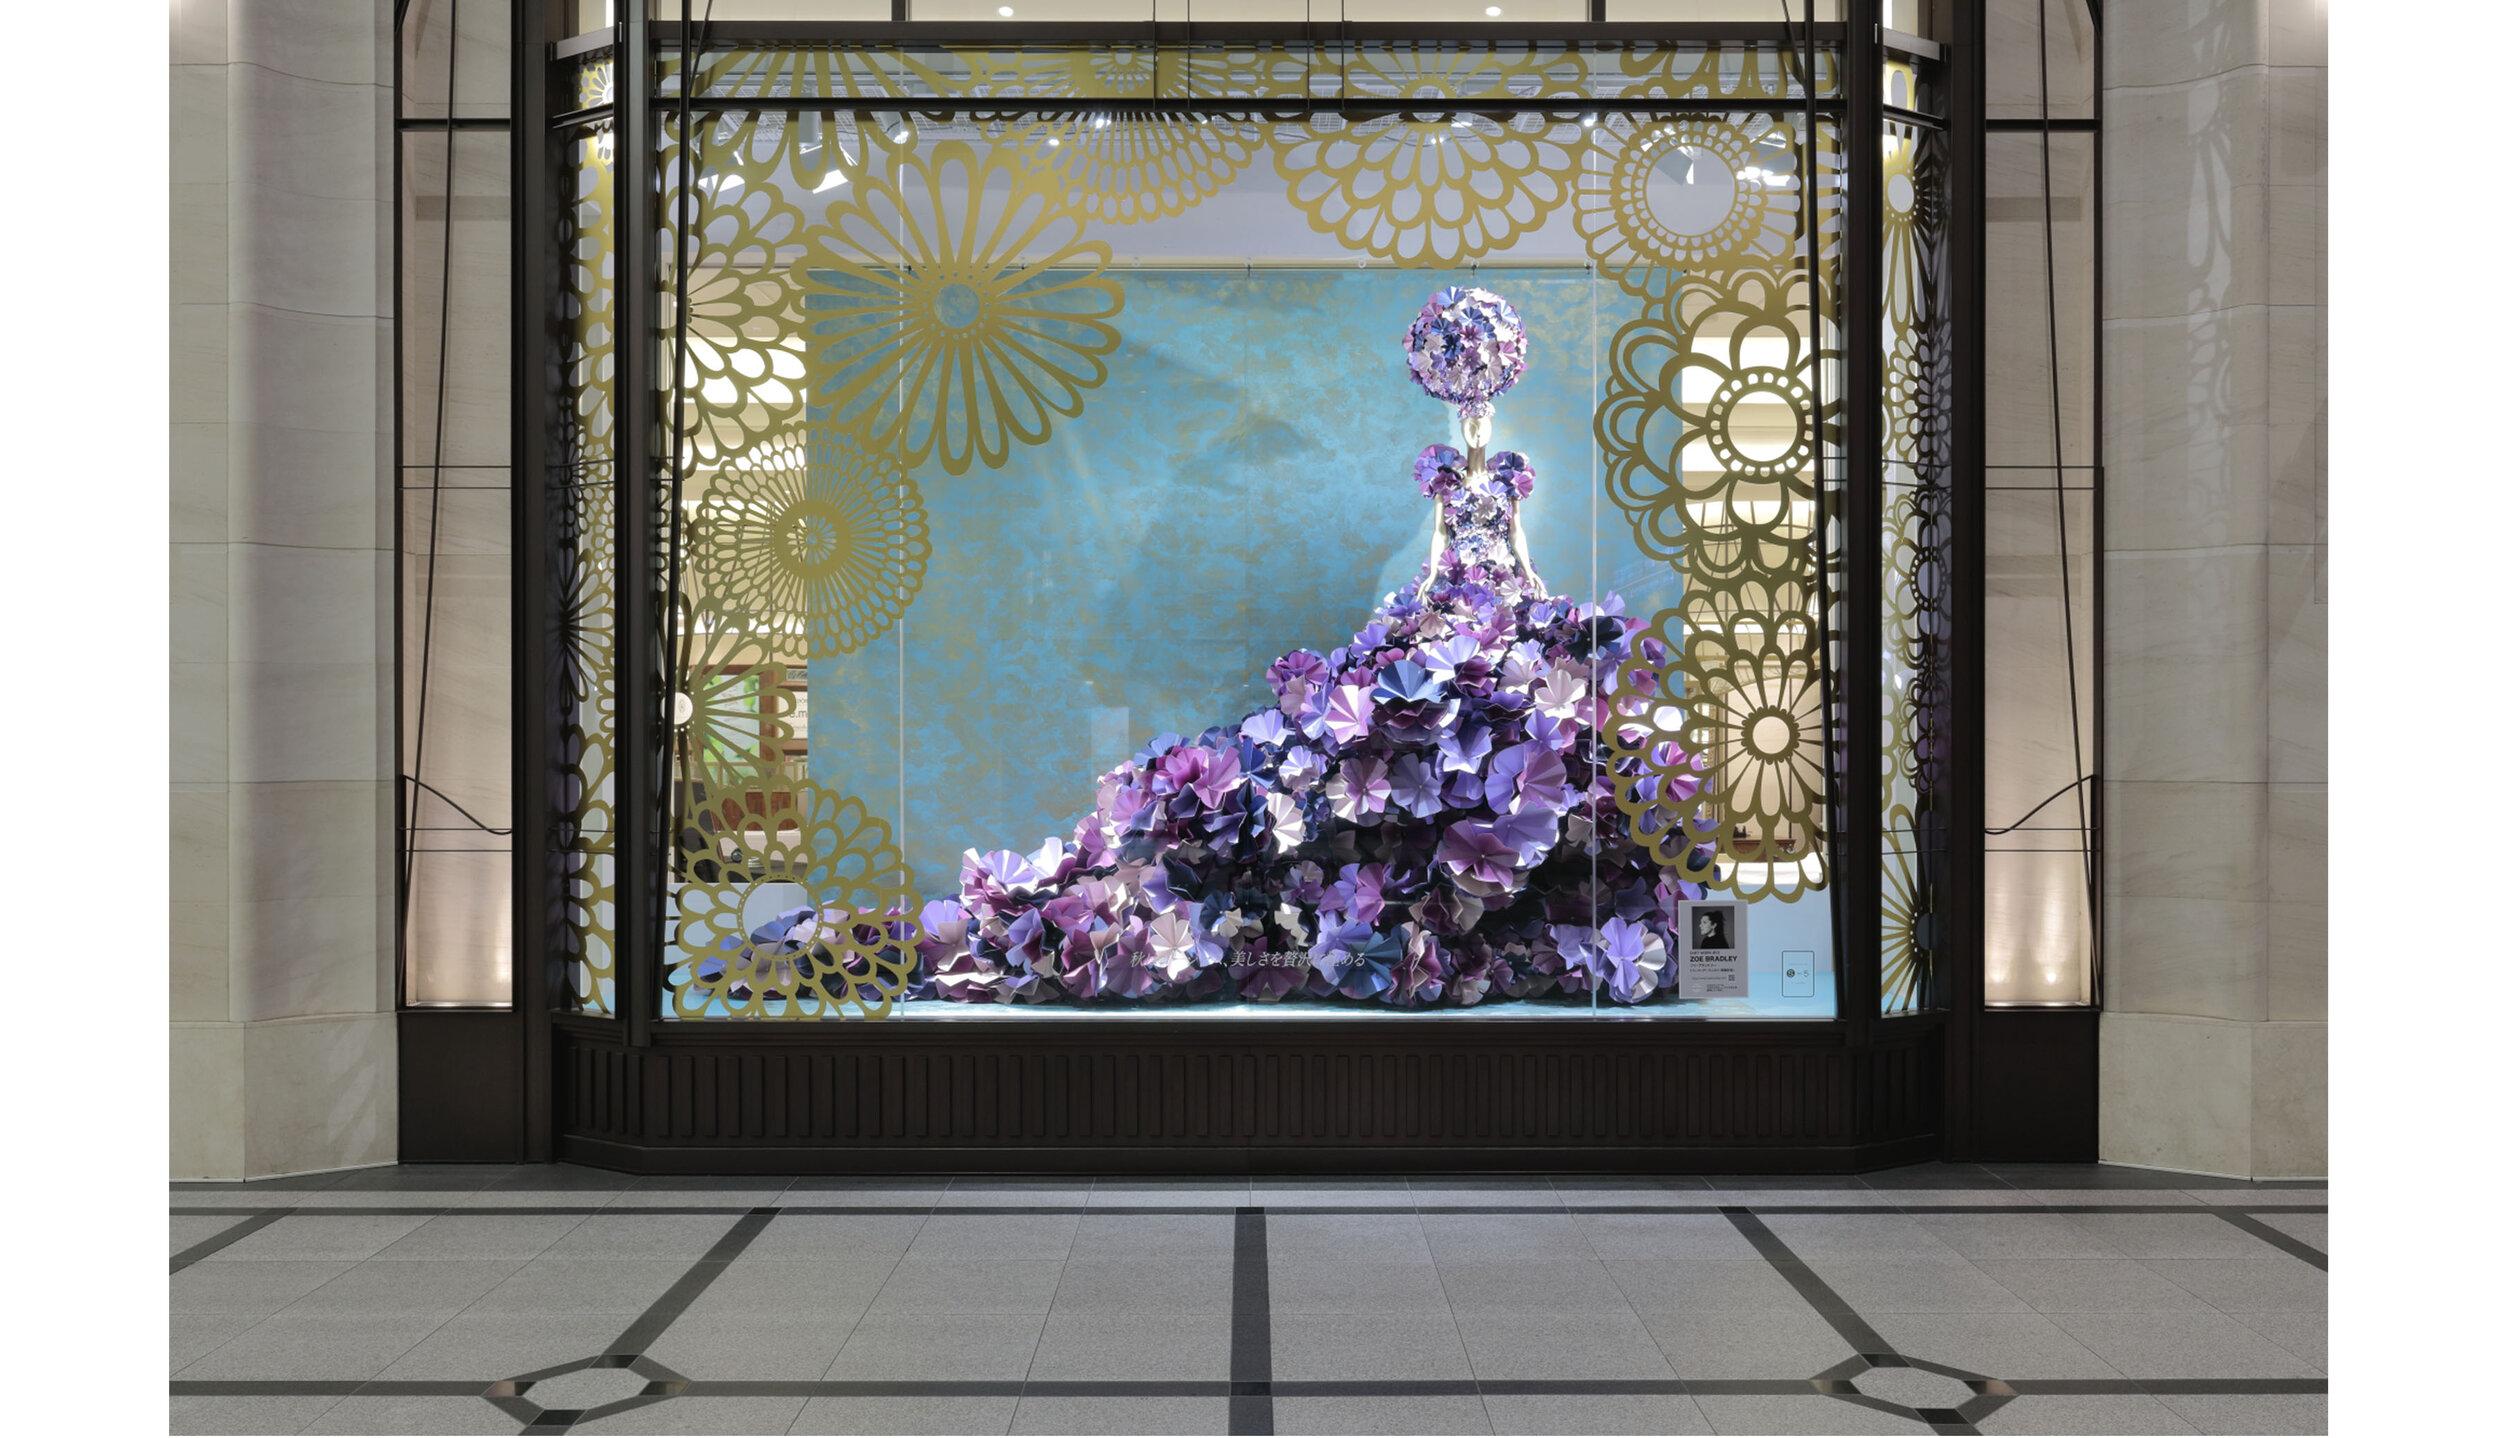 hankyu-window-display-zoebradleydesign-paperdress-fashion-paper-IWD